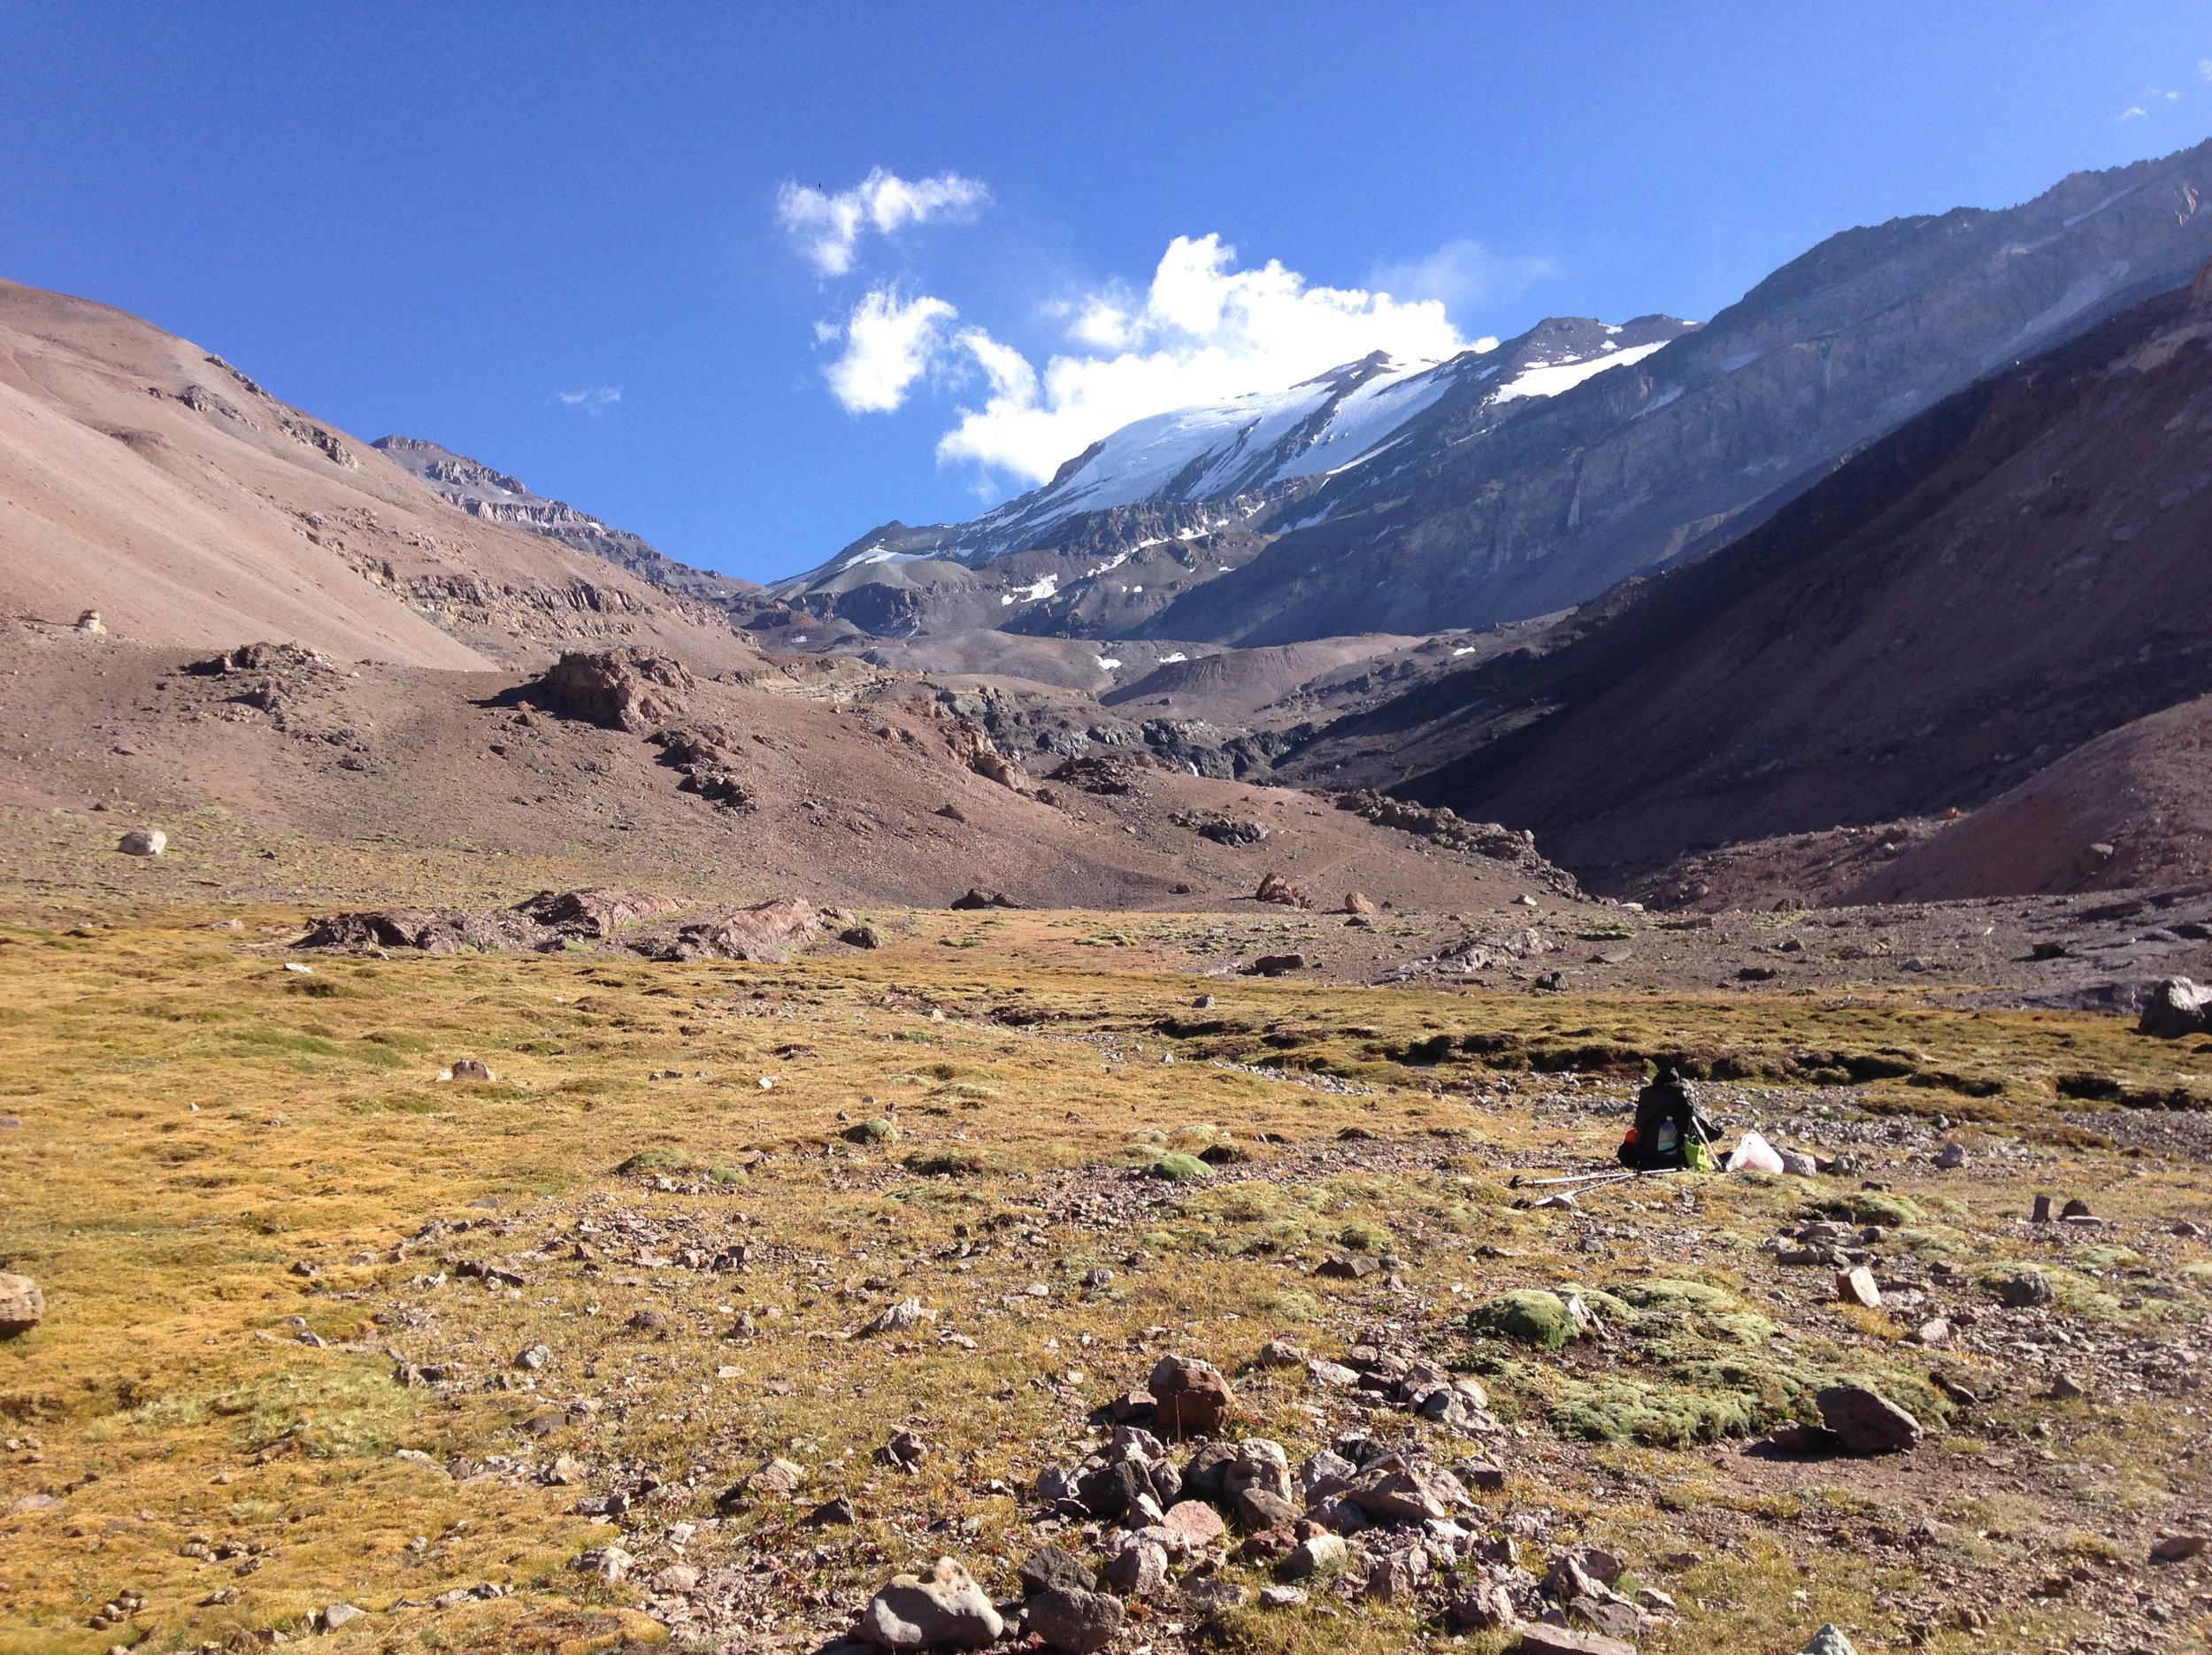 The view of Cerro El Plomo (5443m) and her glaciated face, photo taken from Piedra numerada